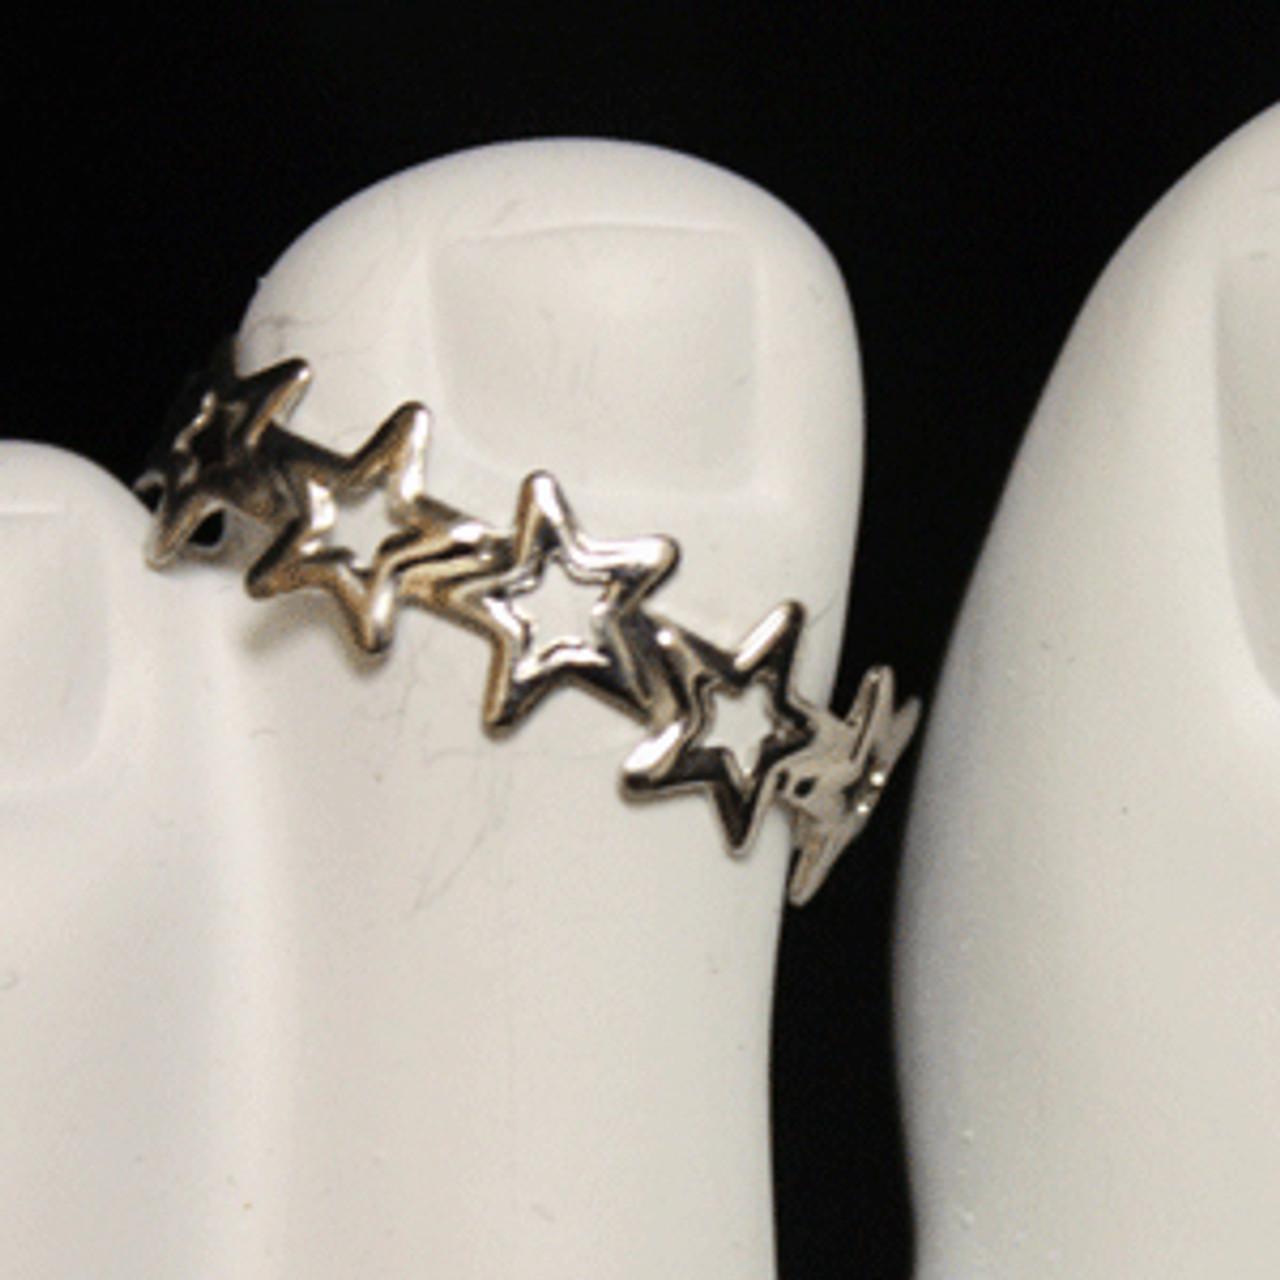 Star toe ring